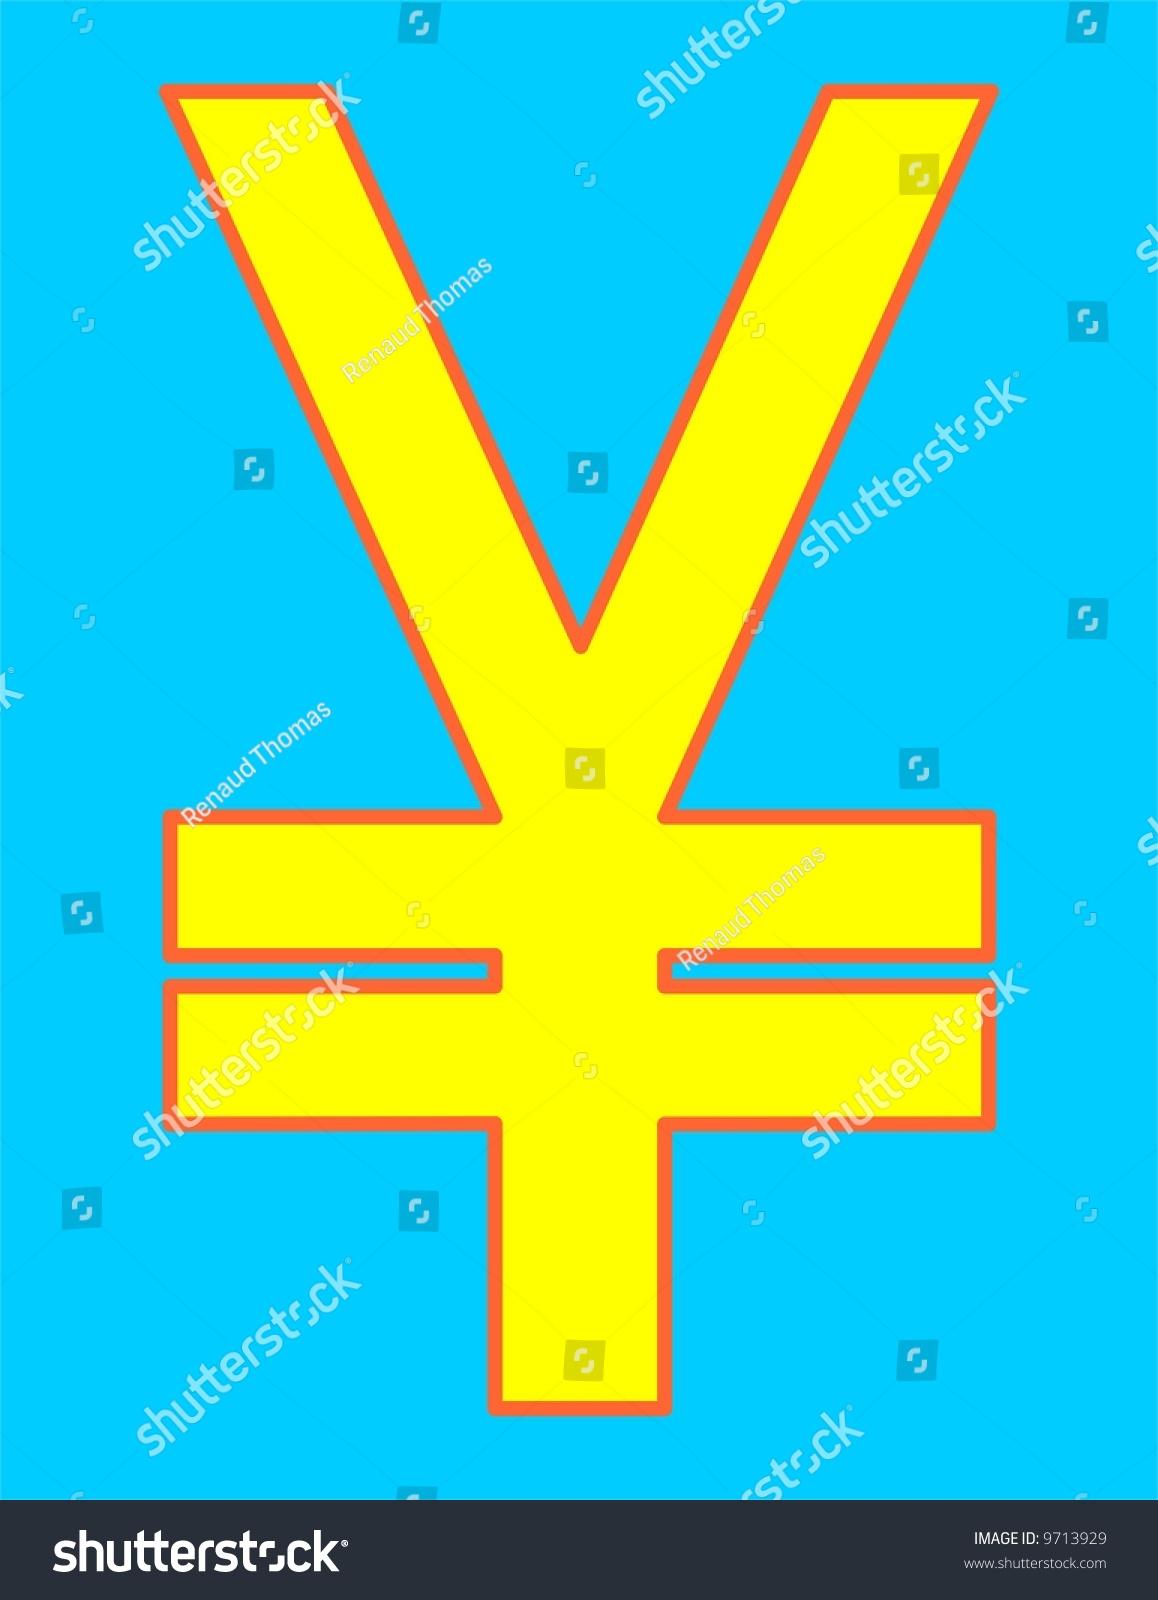 Yen yuan currency symbol stock illustration 9713929 shutterstock yen or yuan currency symbol biocorpaavc